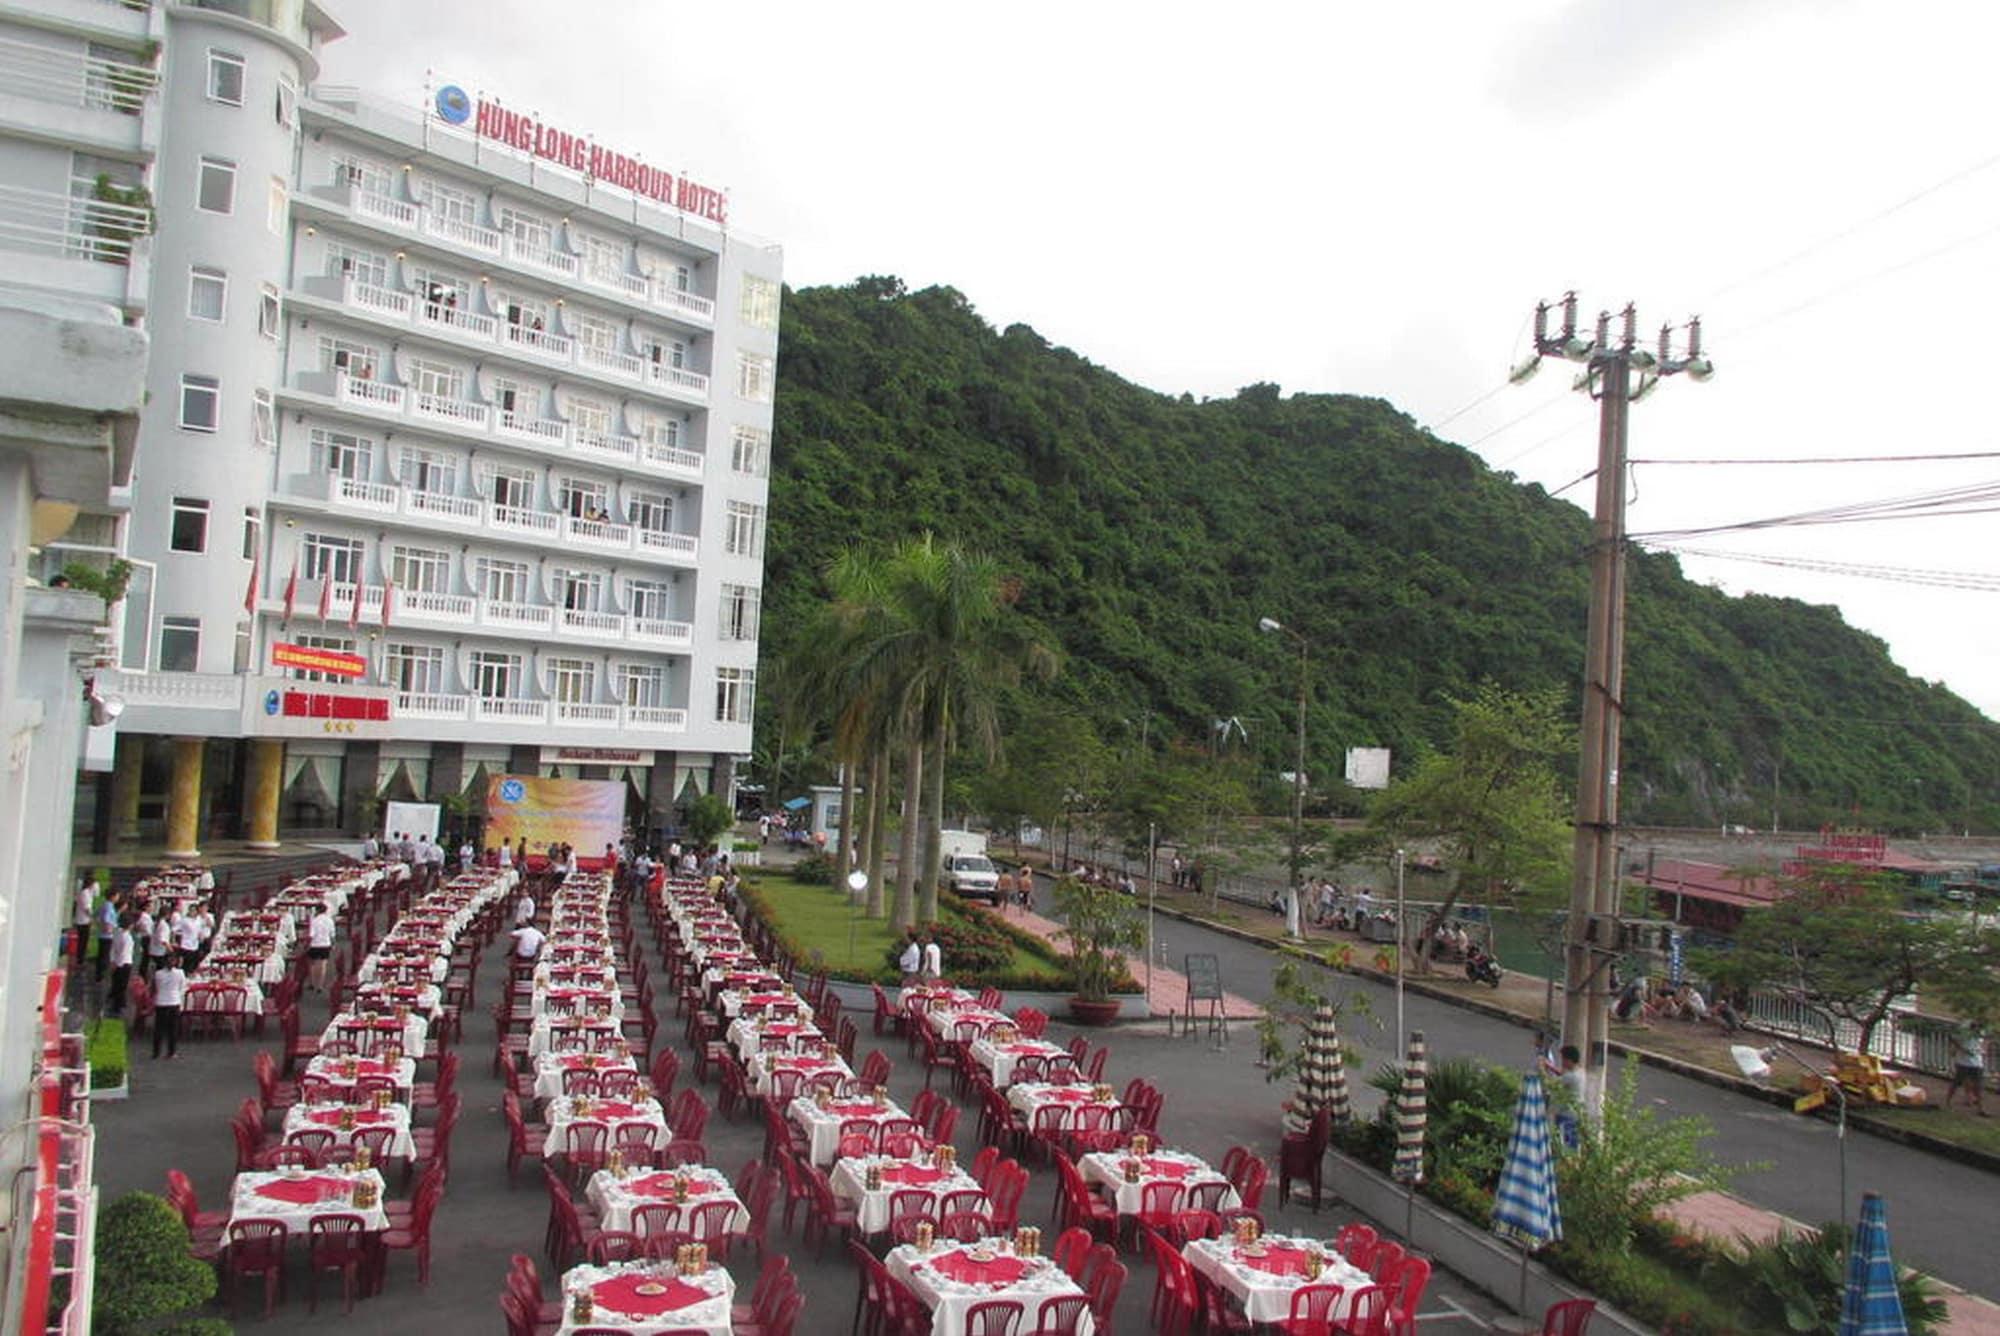 Hung Long Harbour Hotel, Cát Hải